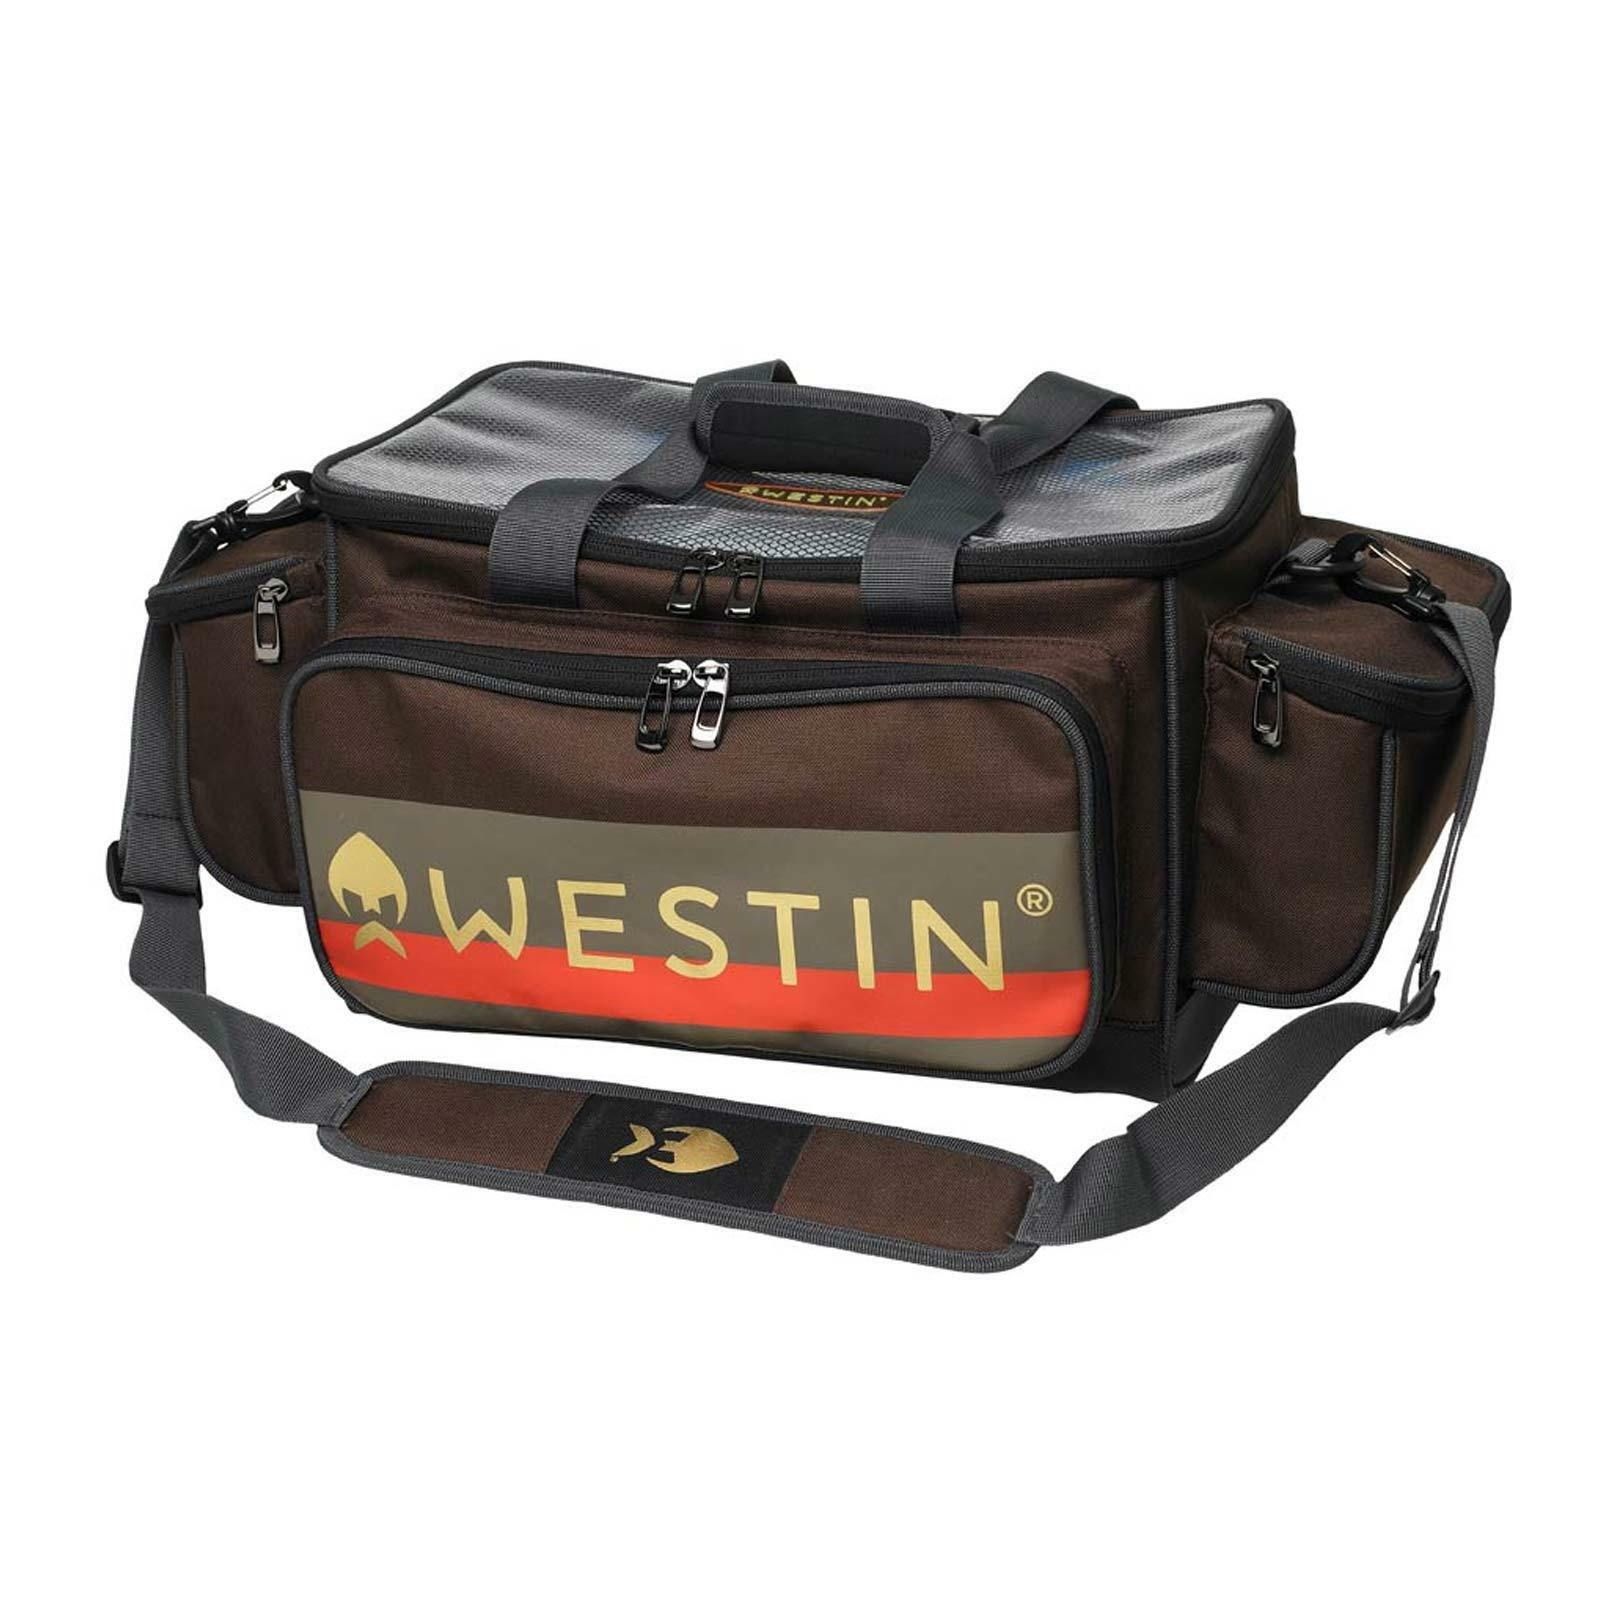 Westin Bolso Bolsa de Pesca Grande - W3 Atraer Loader con 4 Cajas 55 x 31 X 25CM